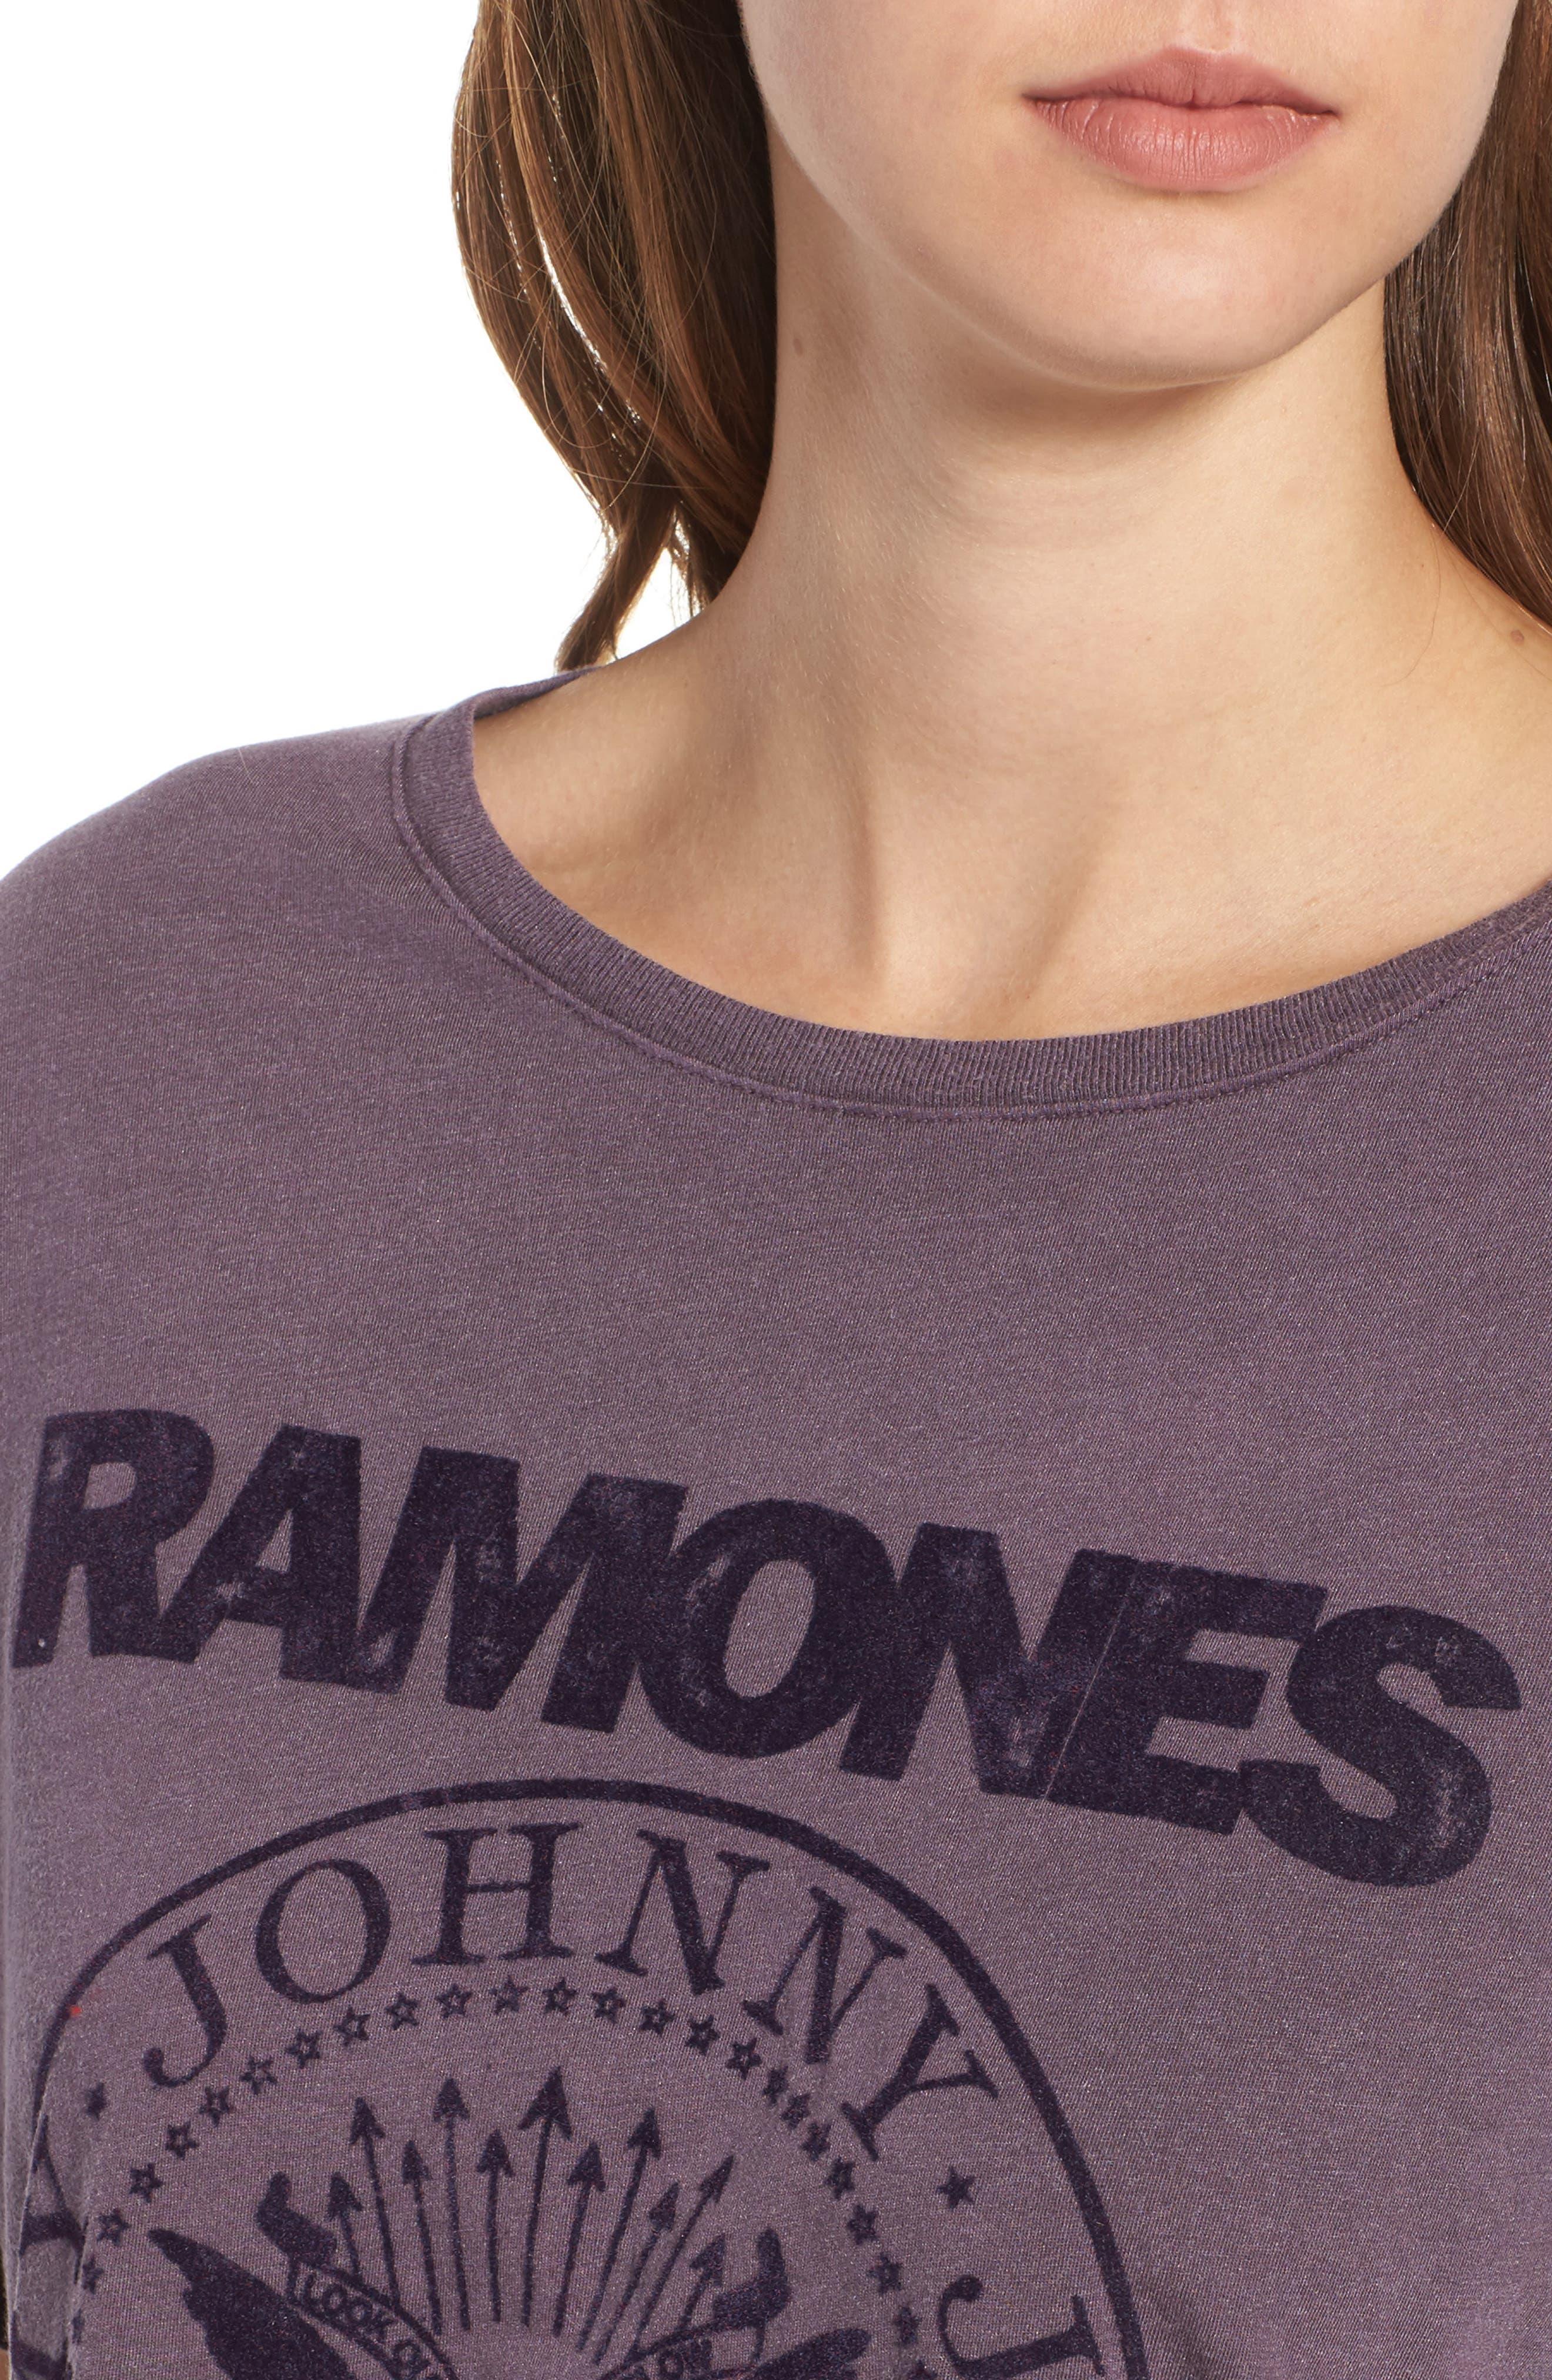 Ramones Tee,                             Alternate thumbnail 4, color,